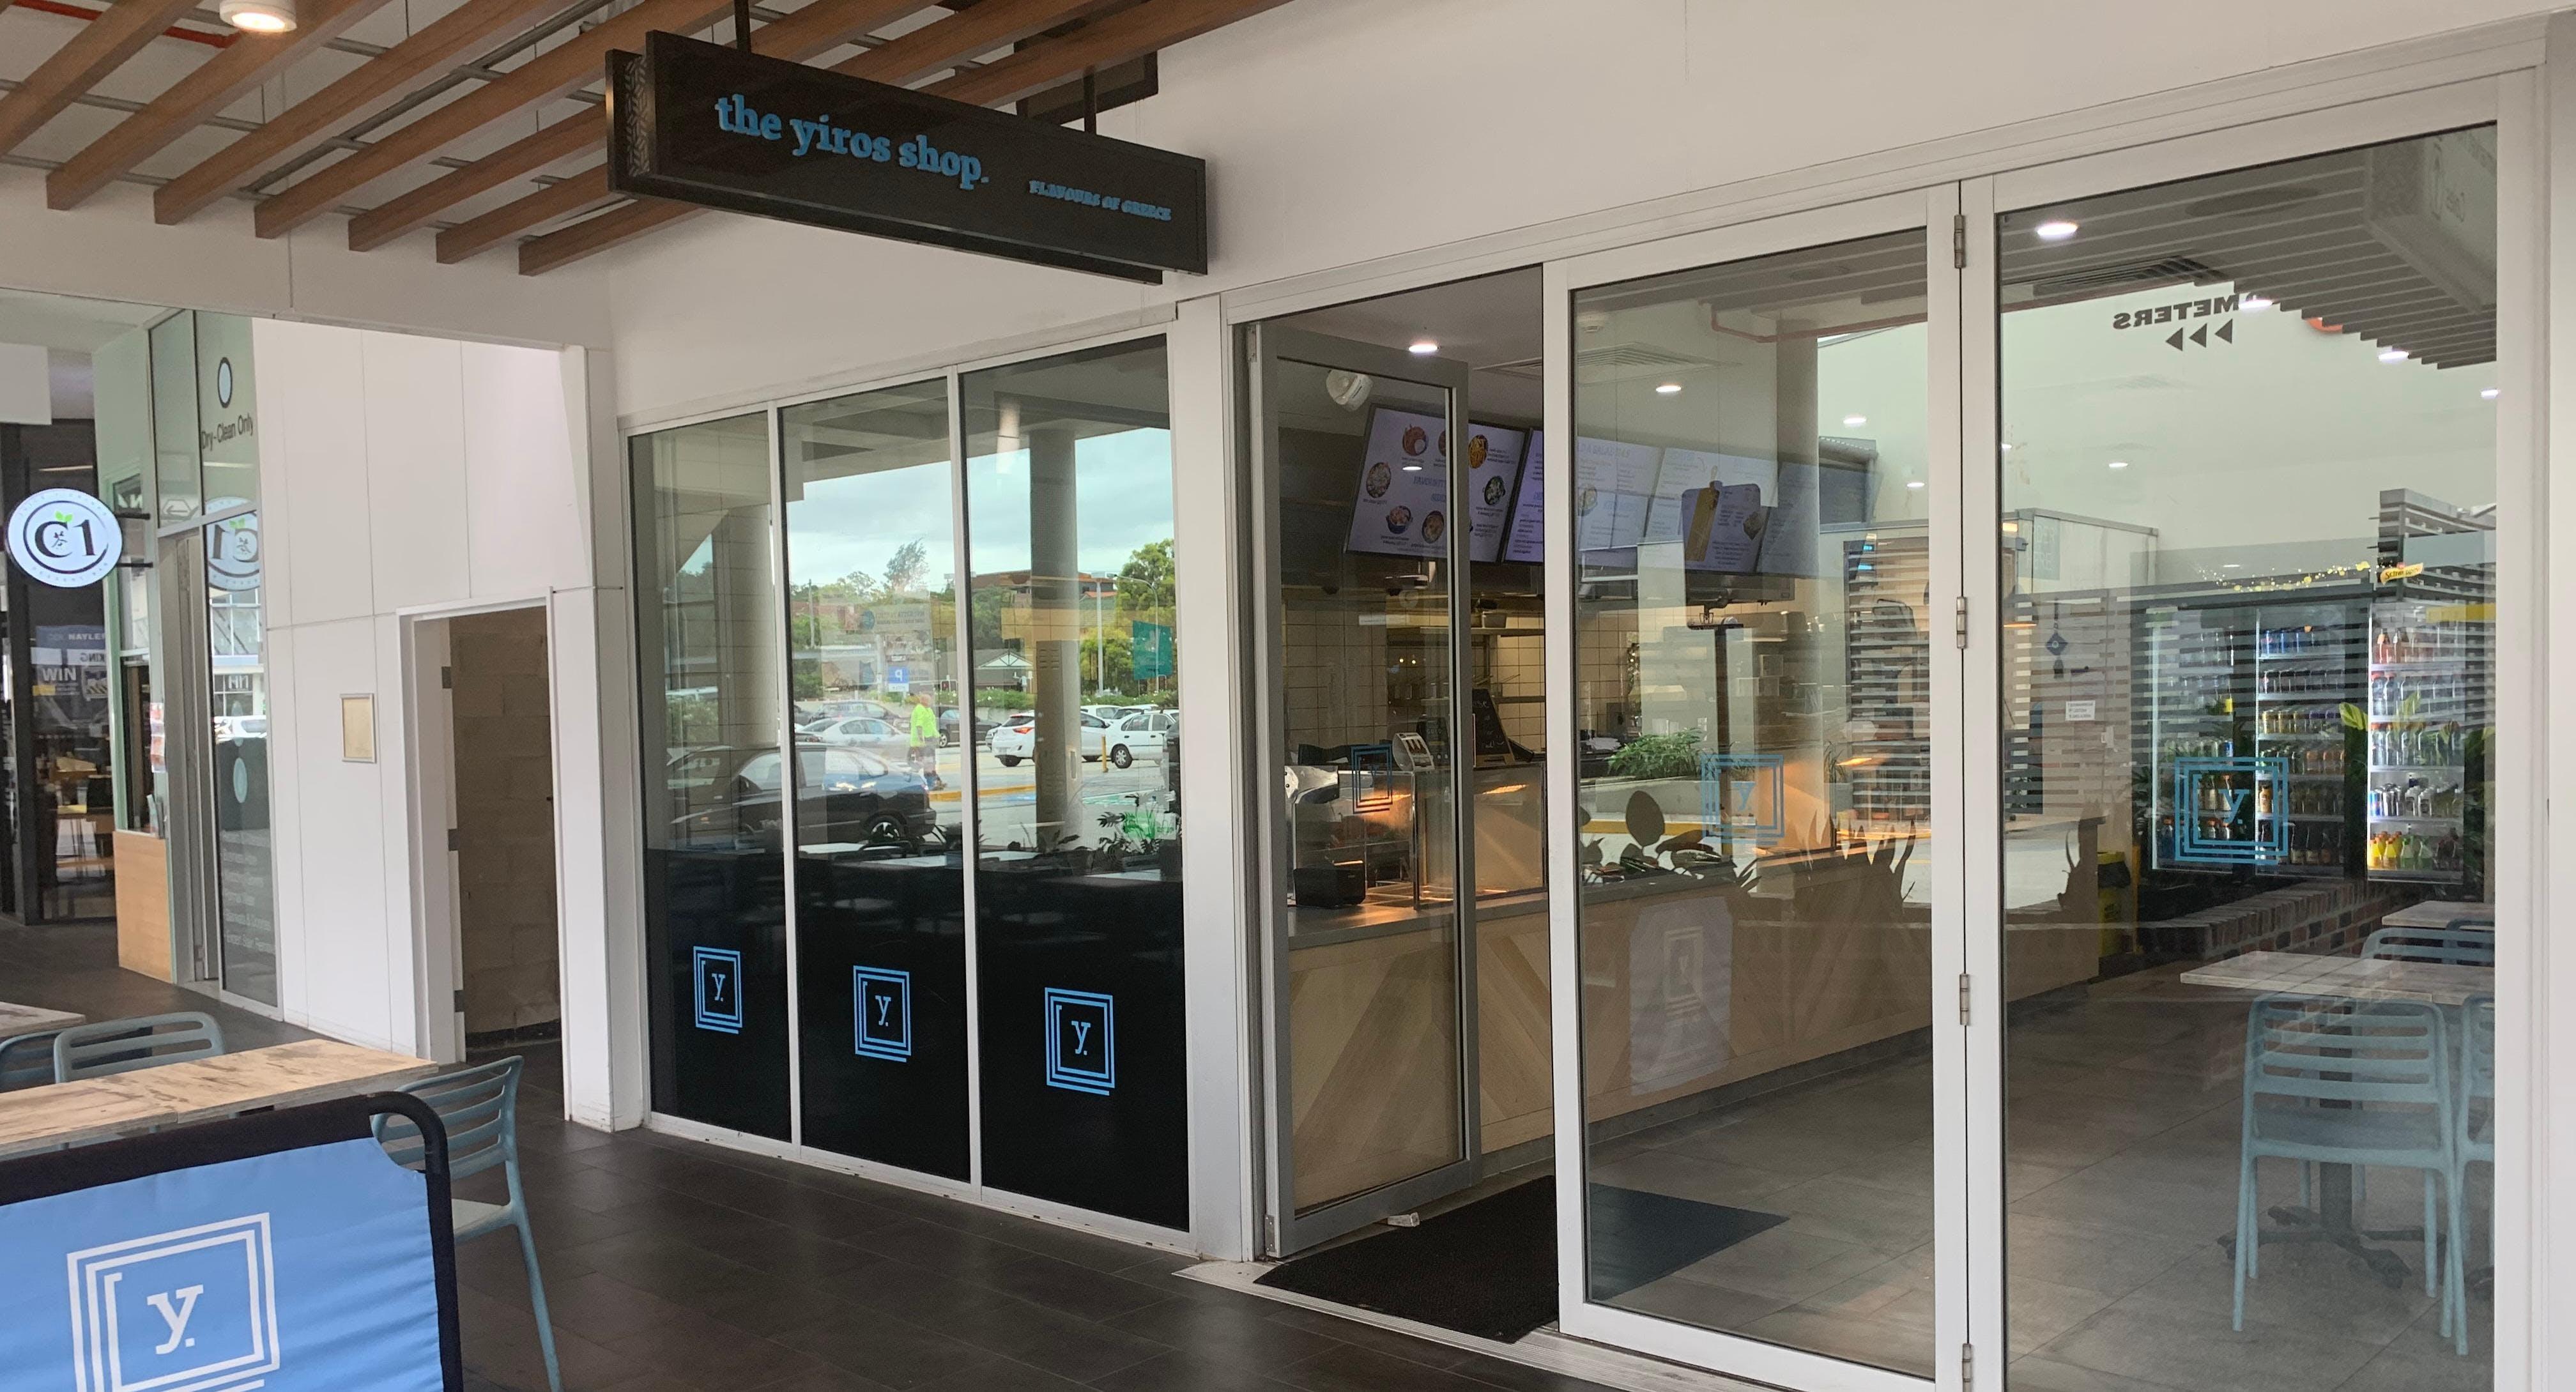 Photo of restaurant The Yiros Shop - Newmarket in Newmarket, Brisbane